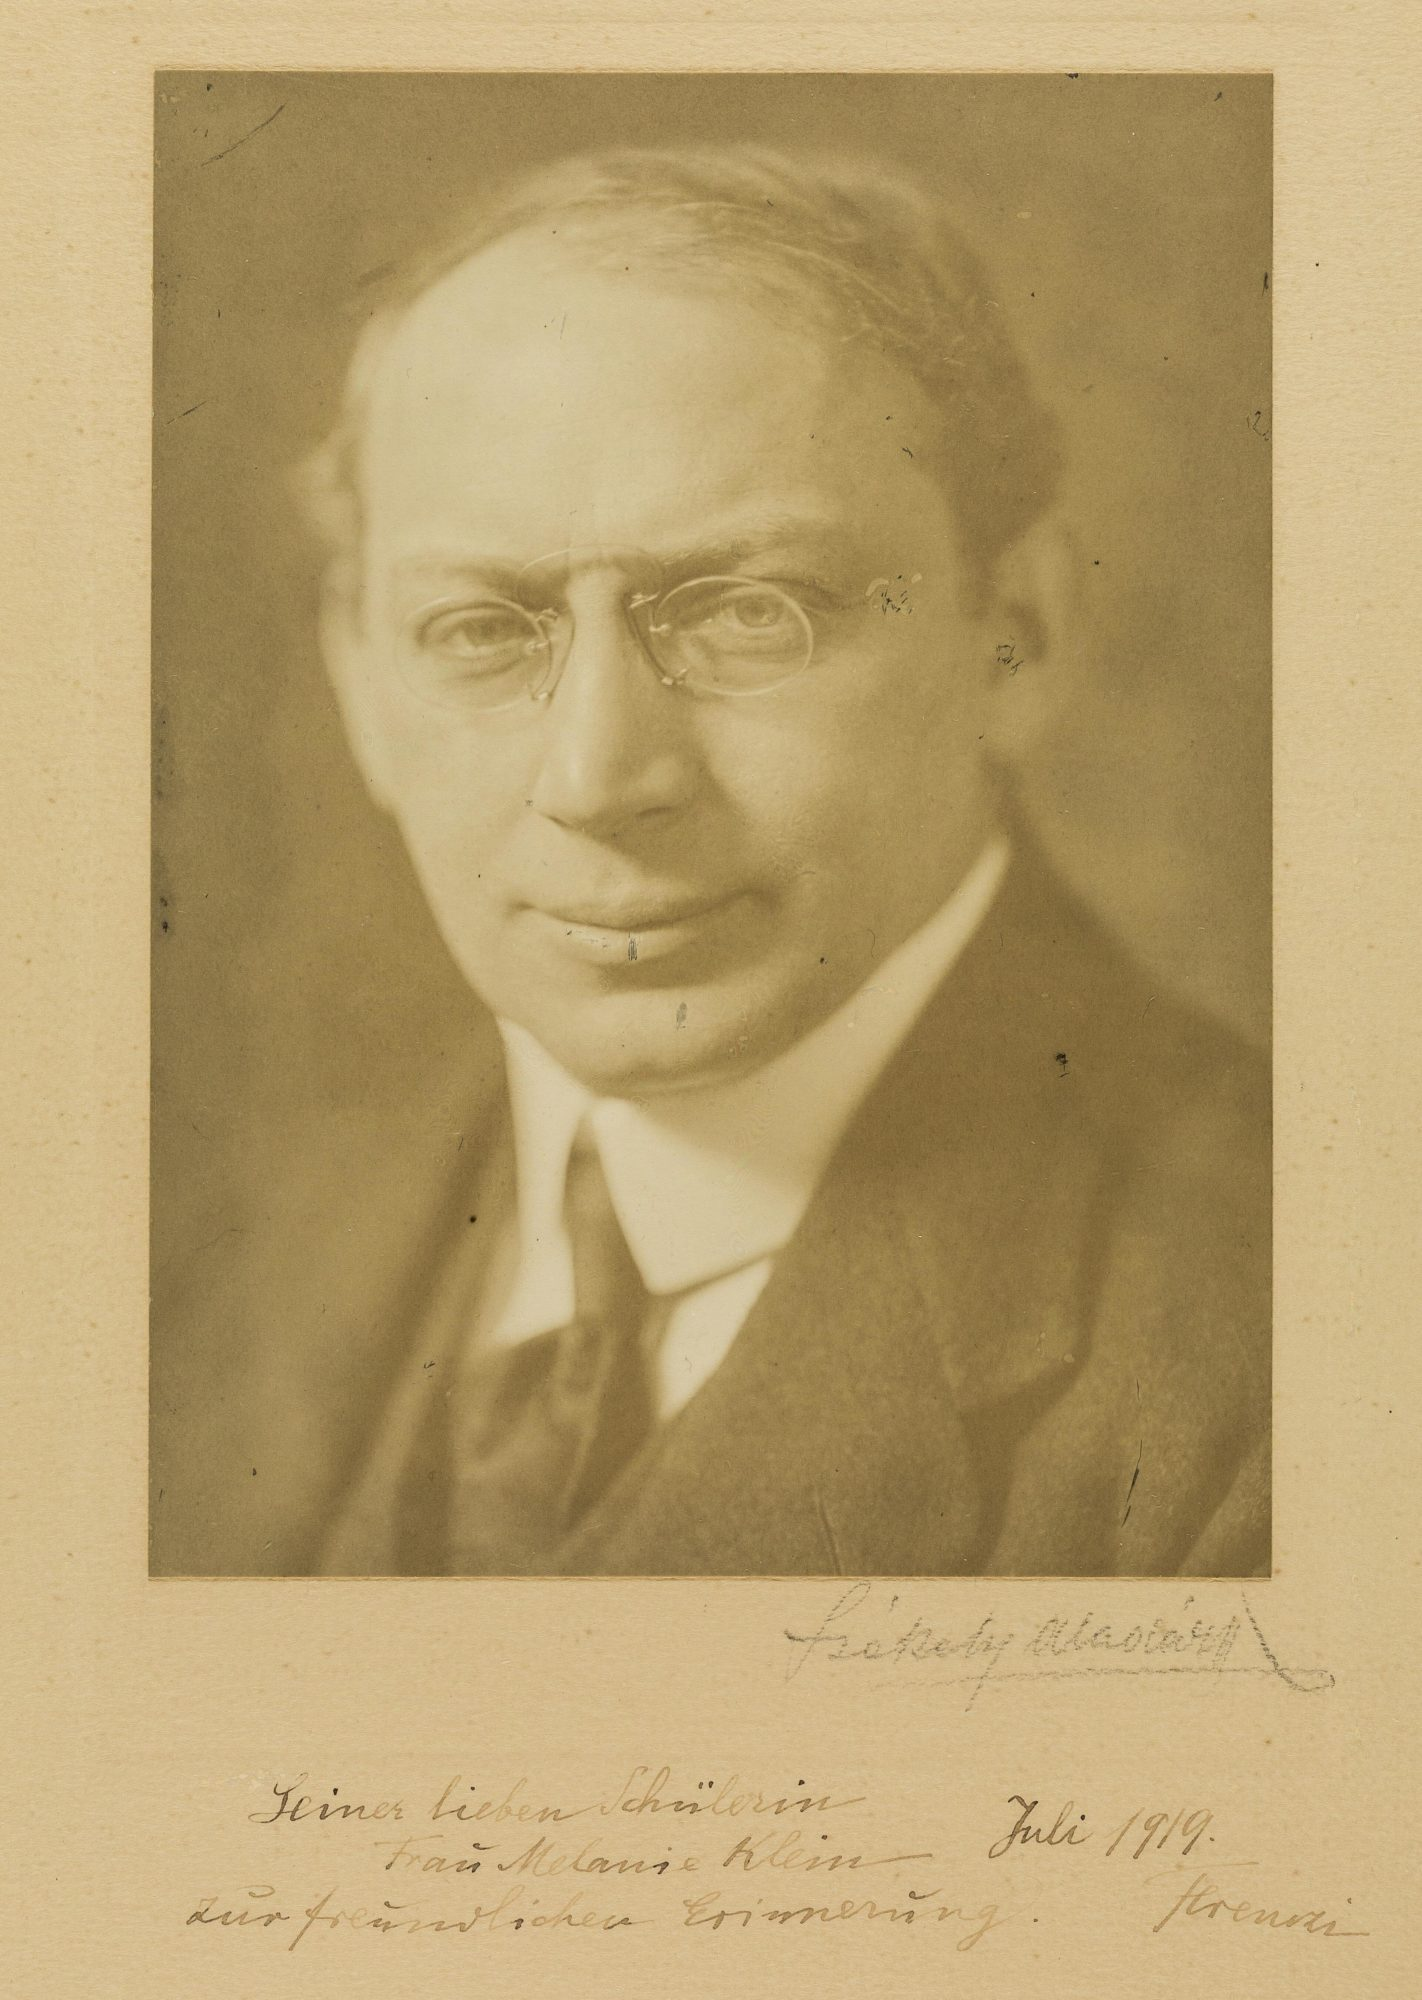 Photograph of psychoanalyst Sandor Ferenczi